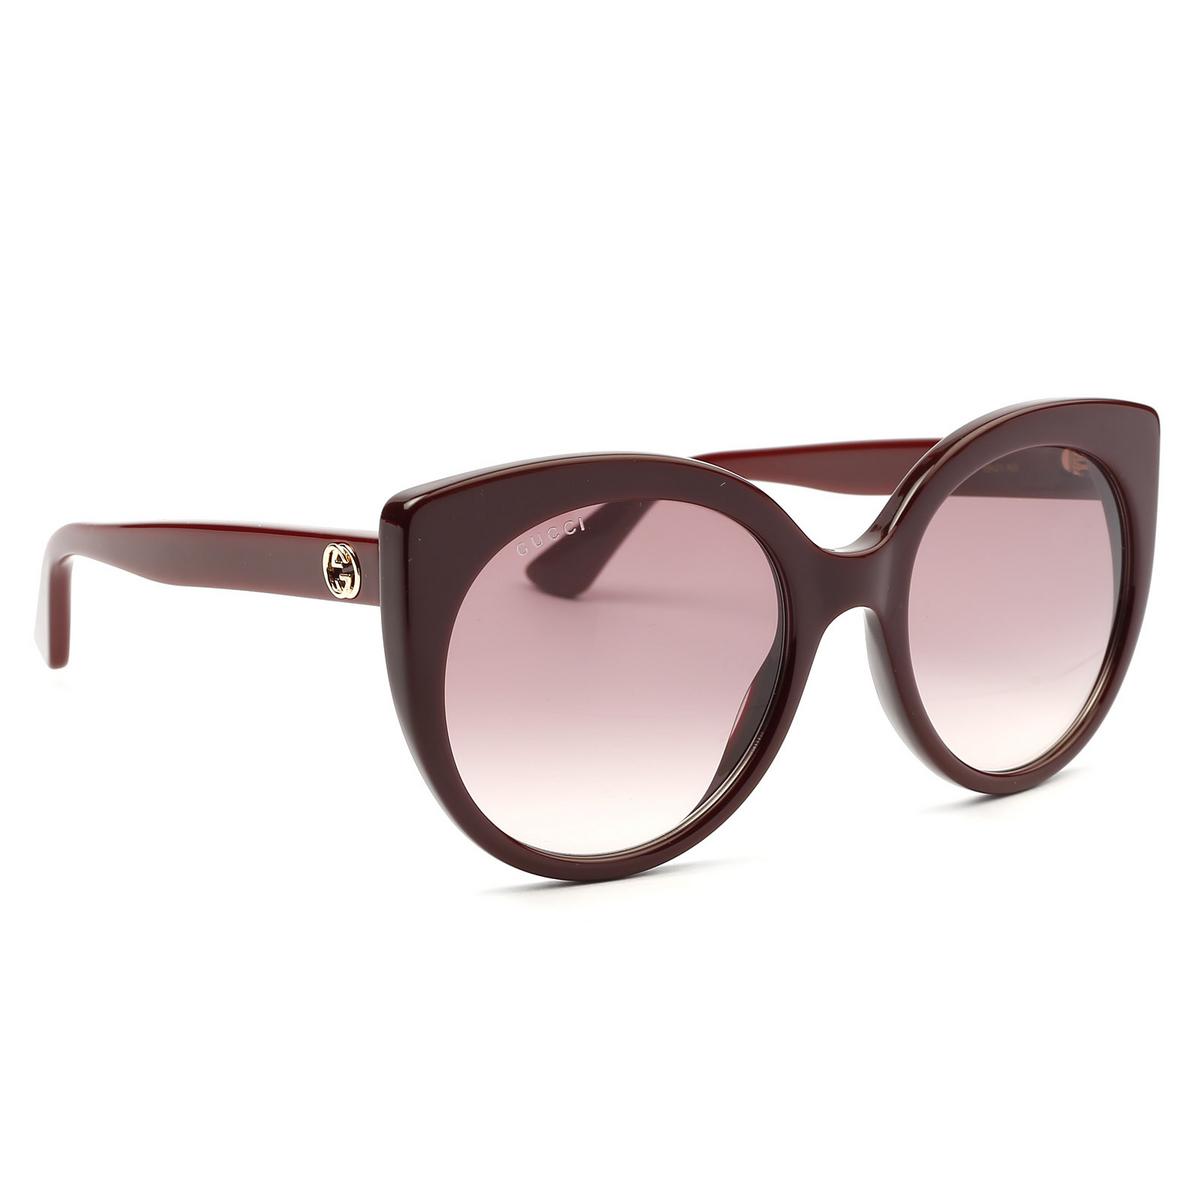 Gucci® Cat-eye Sunglasses: GG0325S color Burgundy 007 - 2/4.